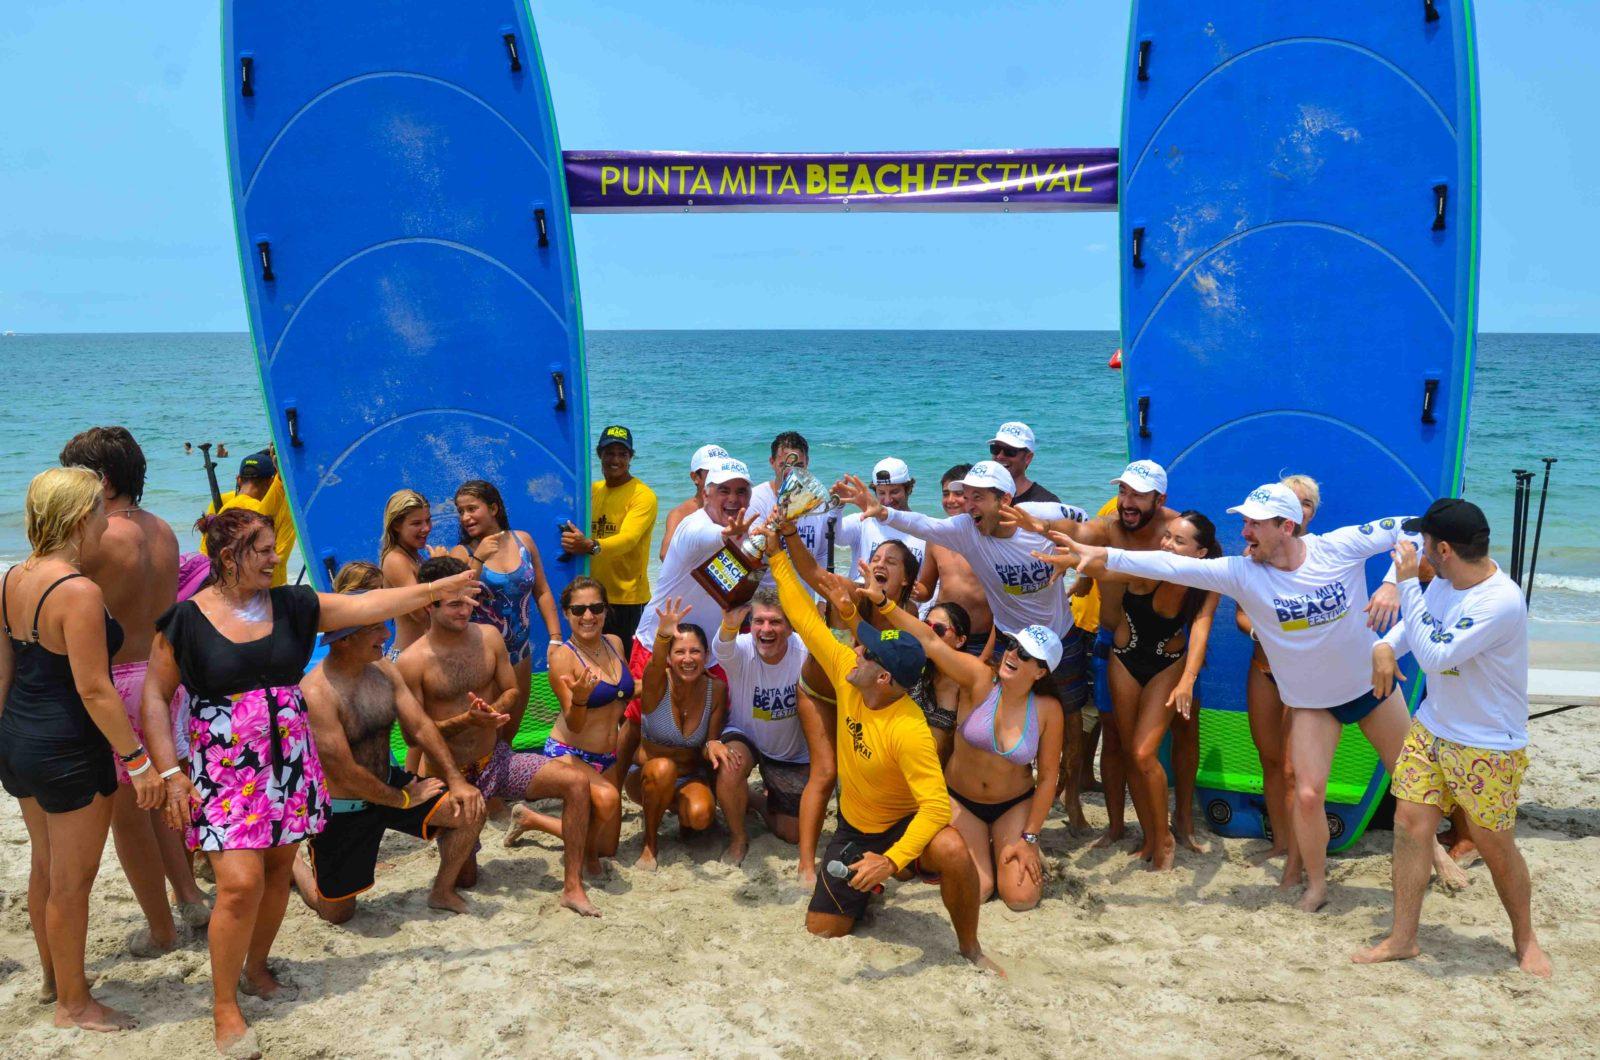 Punta Mita Beach Festival